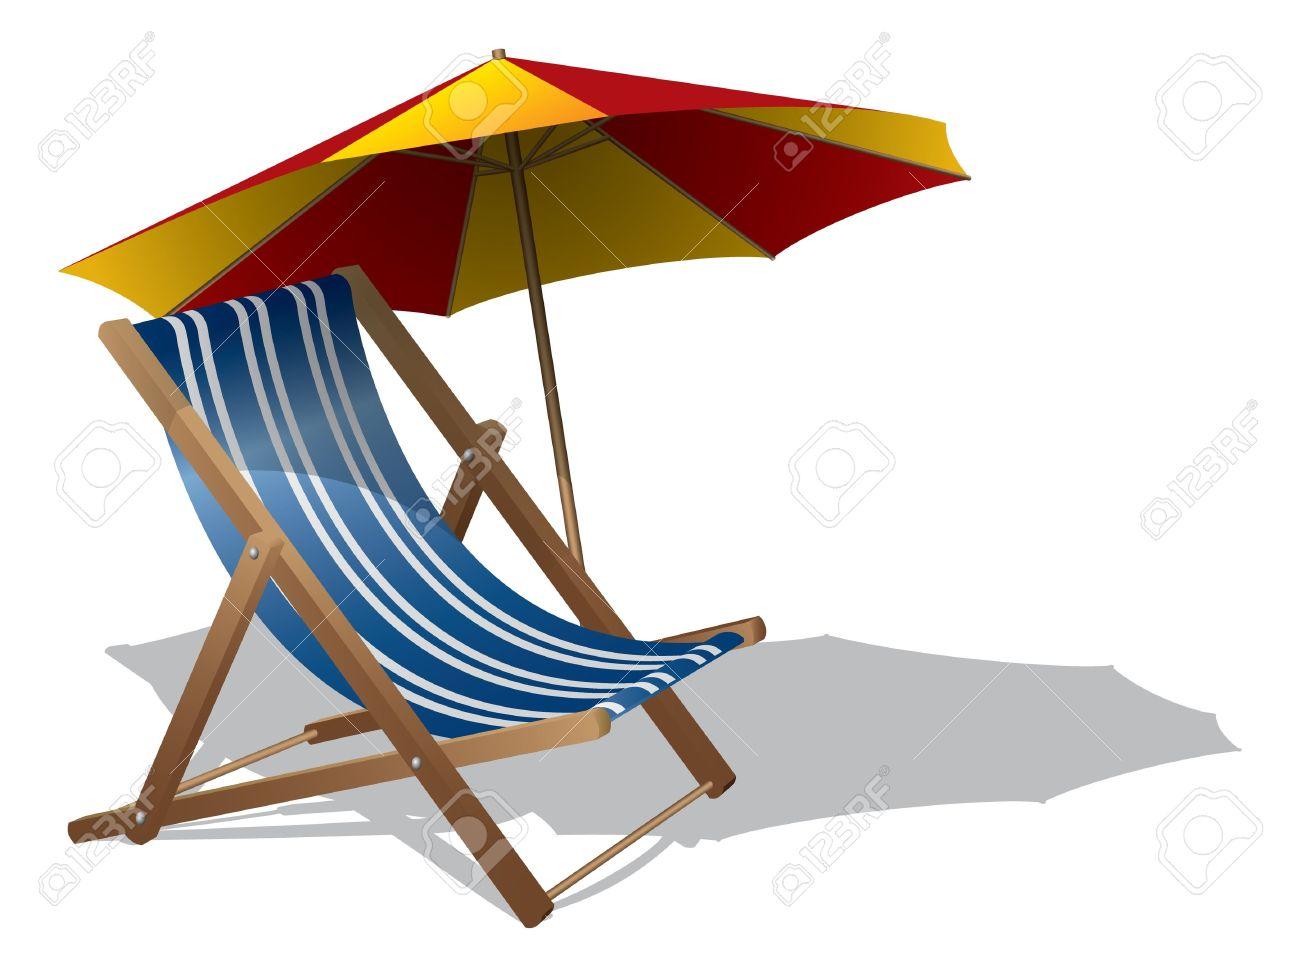 Strandkorb clipart  Frau Im Liegestuhl Clipart | ambiznes.com